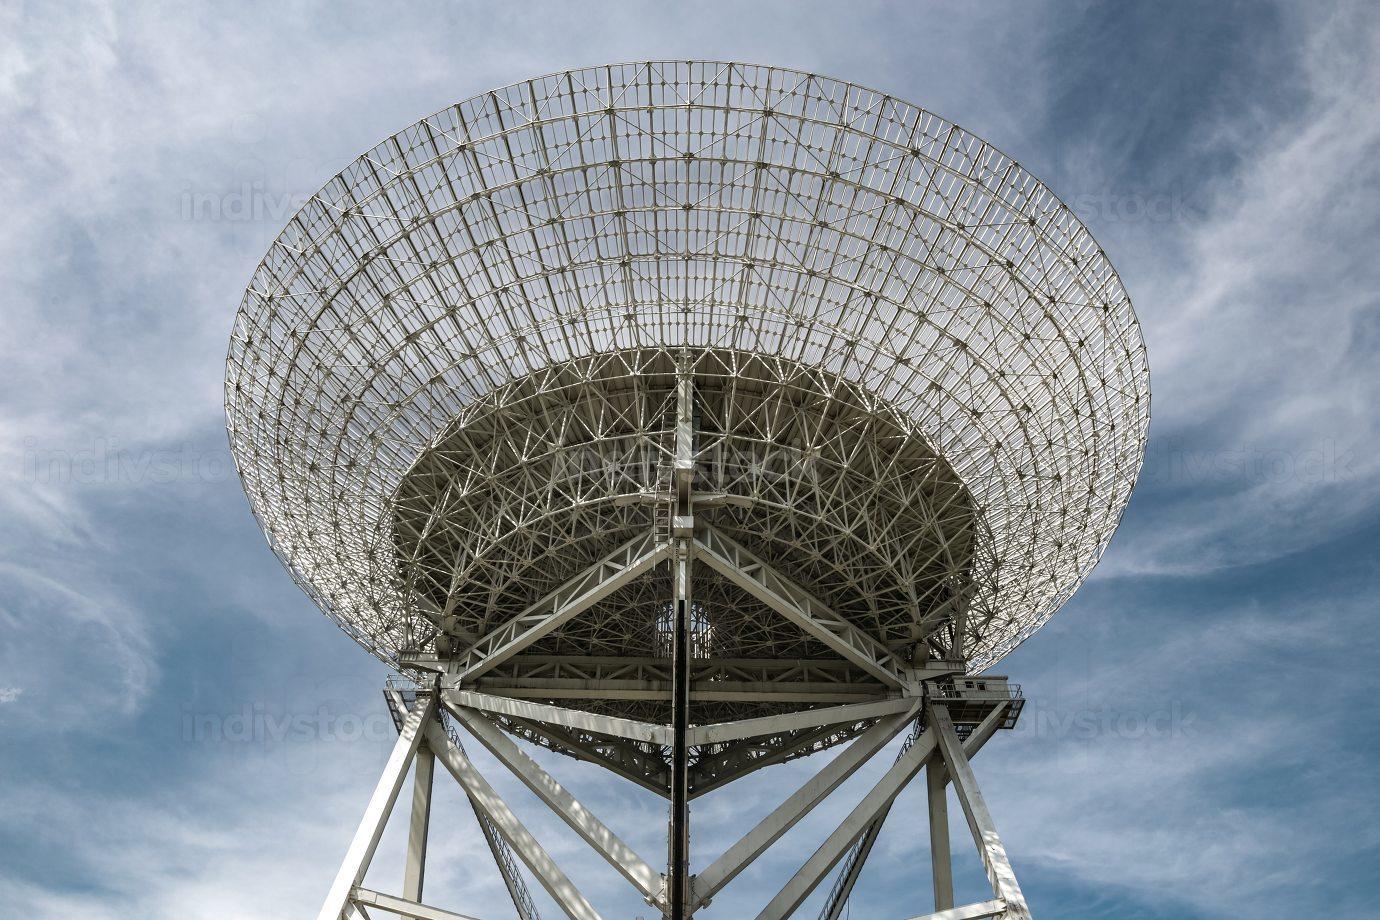 Radio Telescope array in Beijing,China.